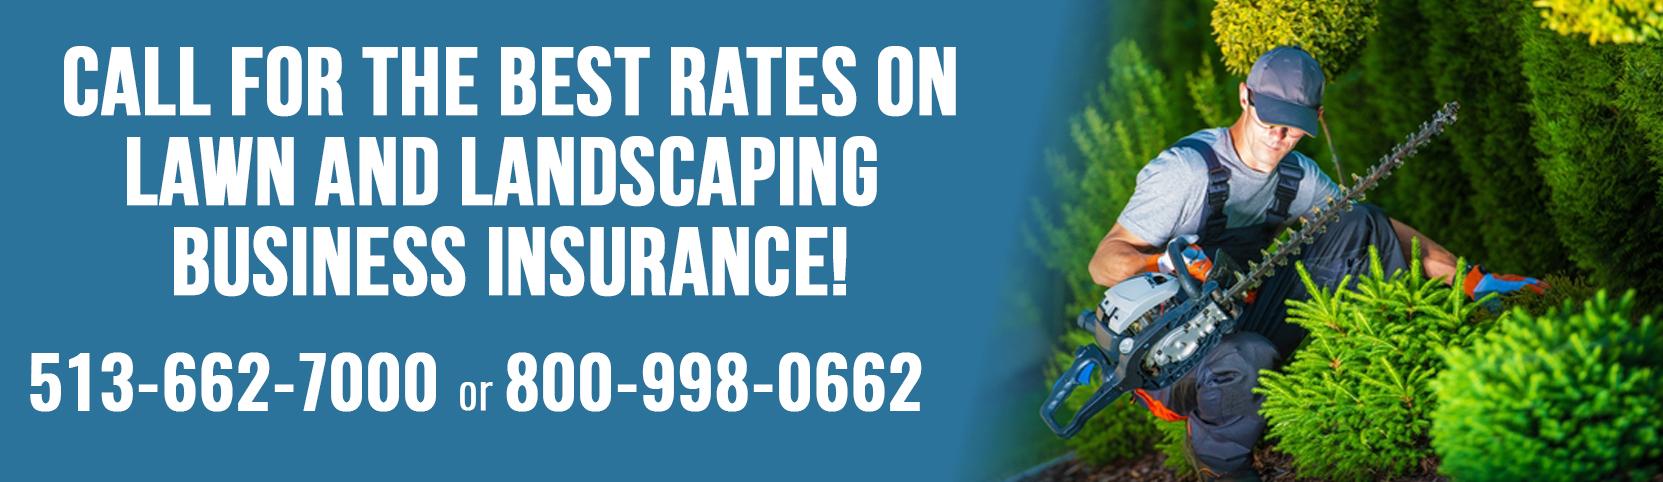 Landscaping Business Insurance Columbus